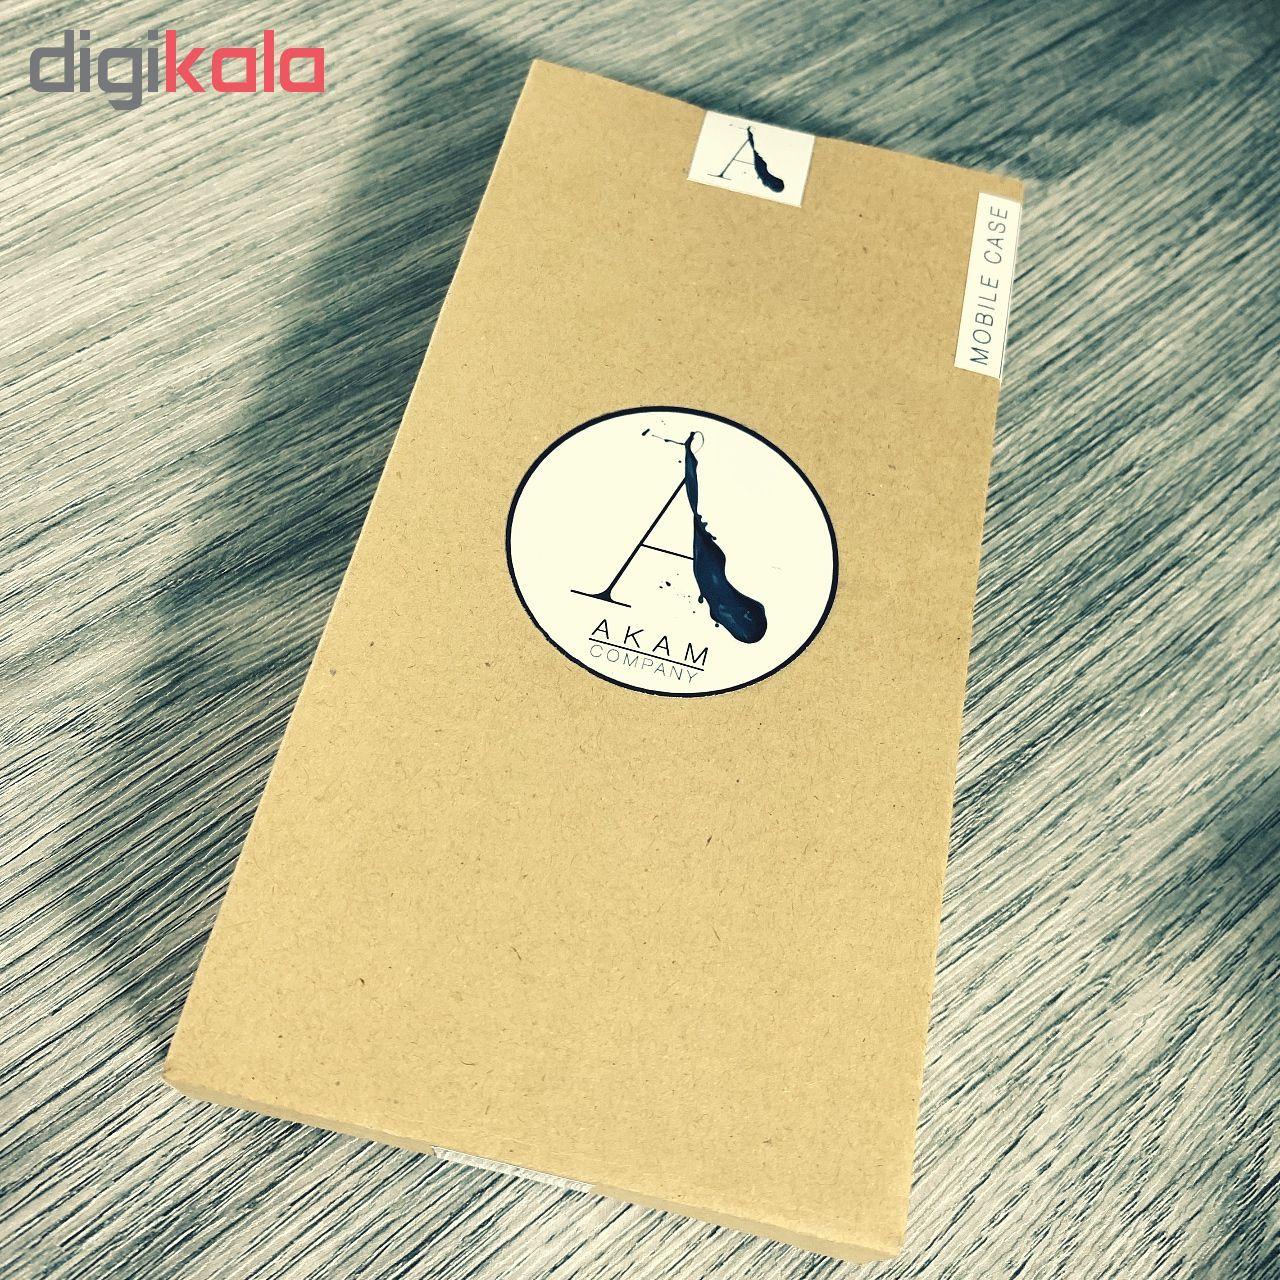 کاور آکام مدل A7P0904 مناسب برای گوشی موبایل اپل iPhone 7 Plus/8 plus main 1 2